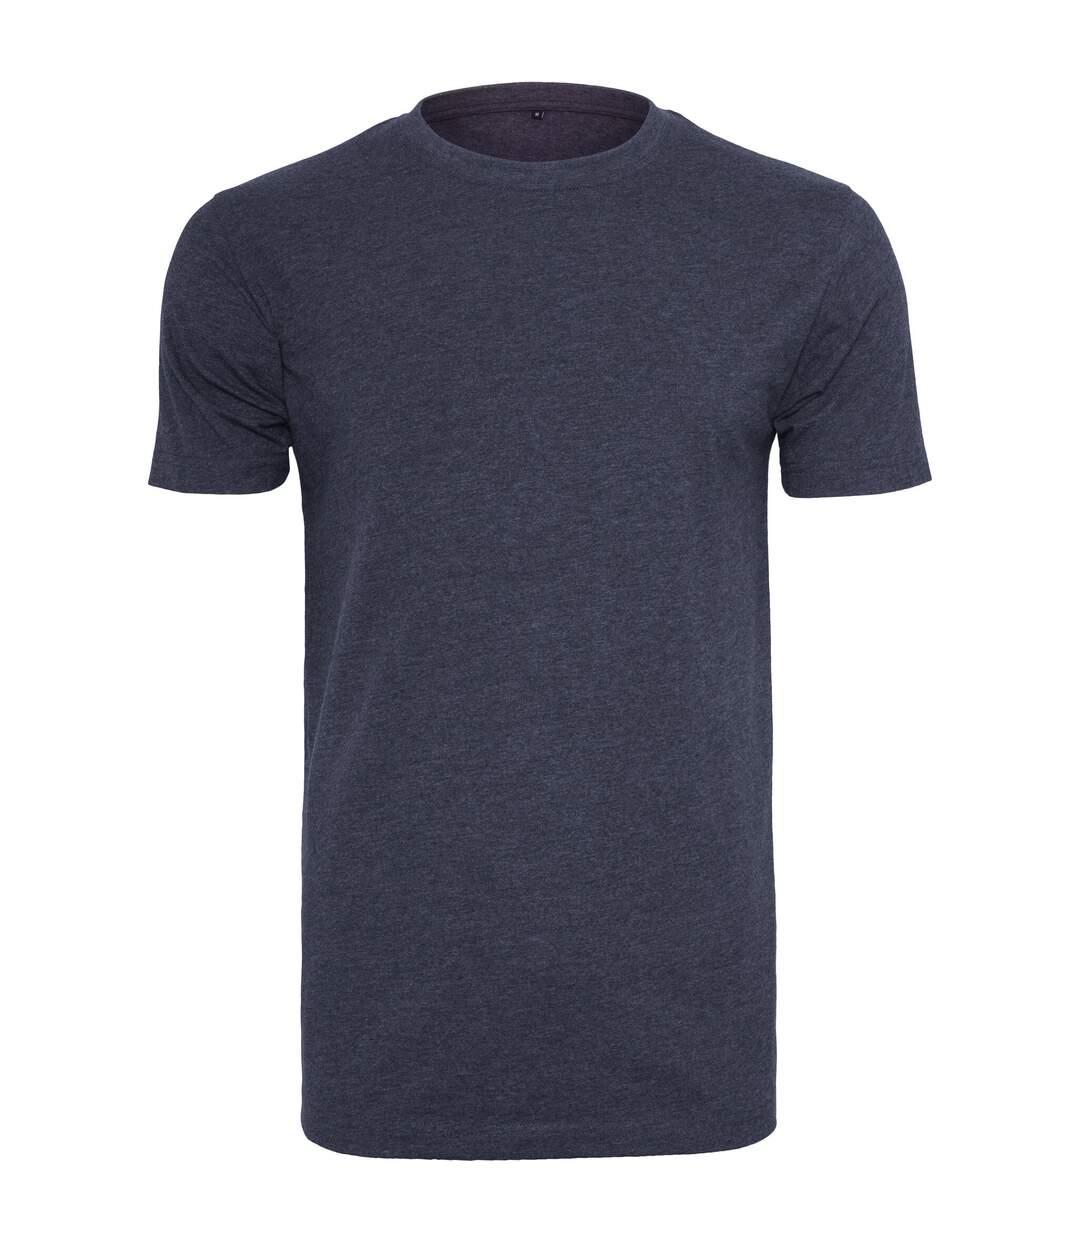 Build Your Brand Mens T-Shirt Round Neck (Navy) - UTRW5815